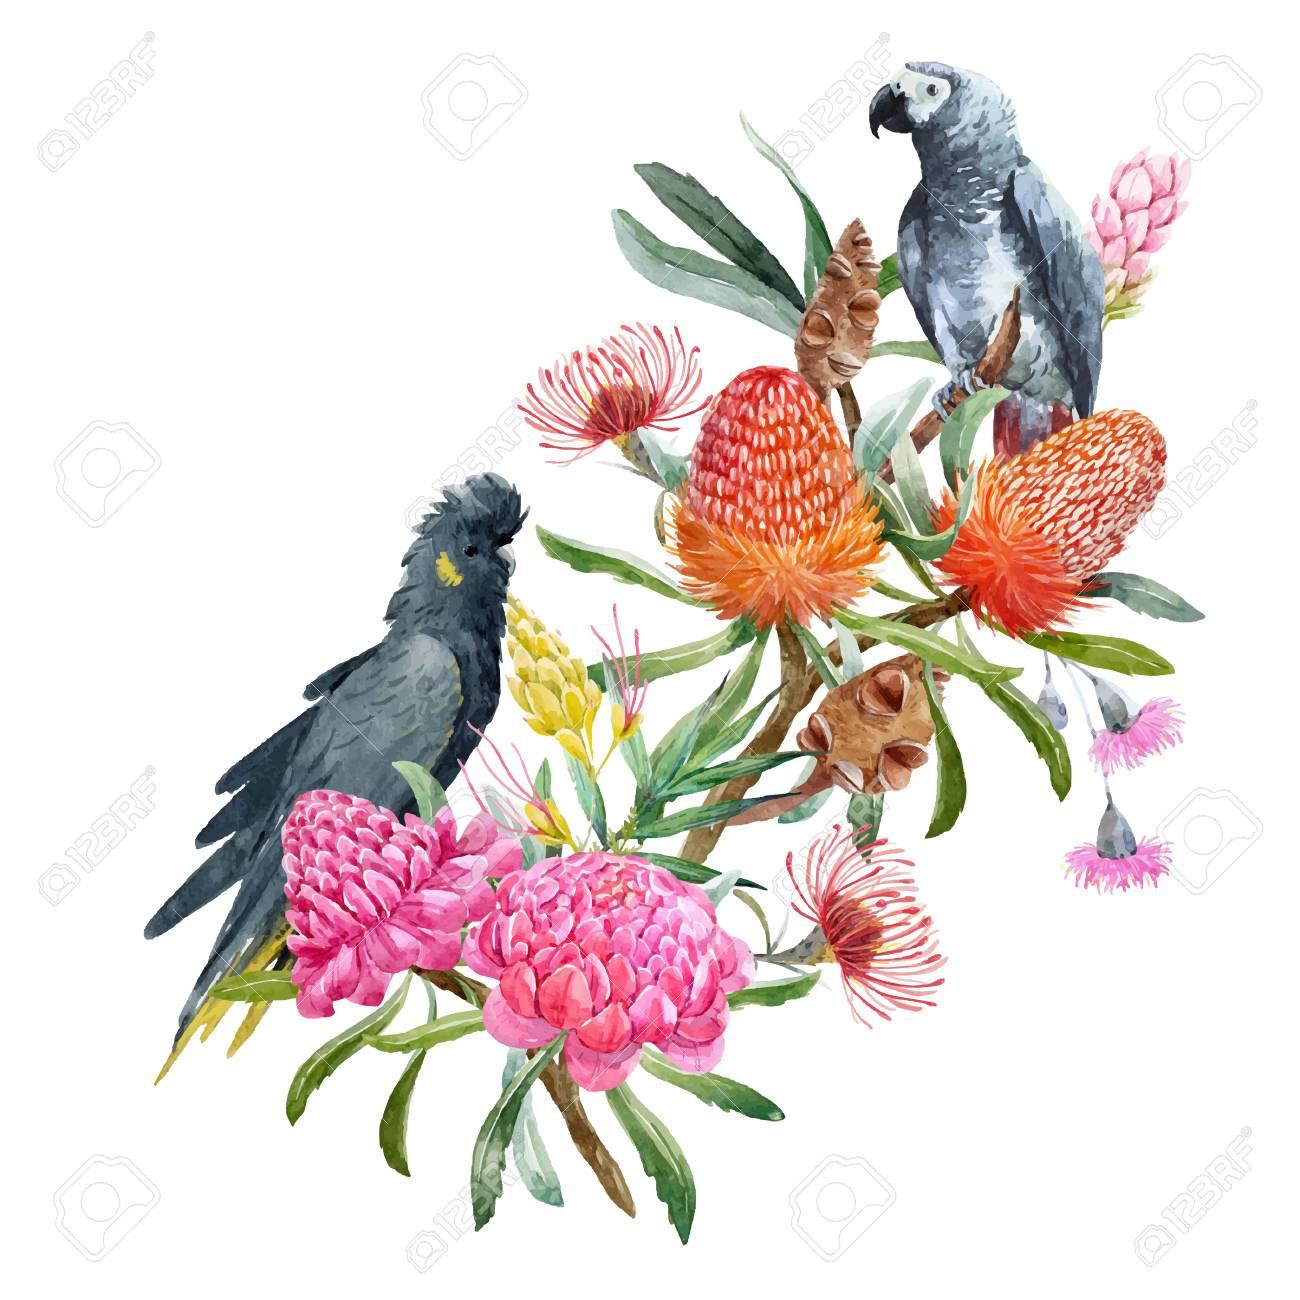 Watercolor banksia flower vector composition - 89914516